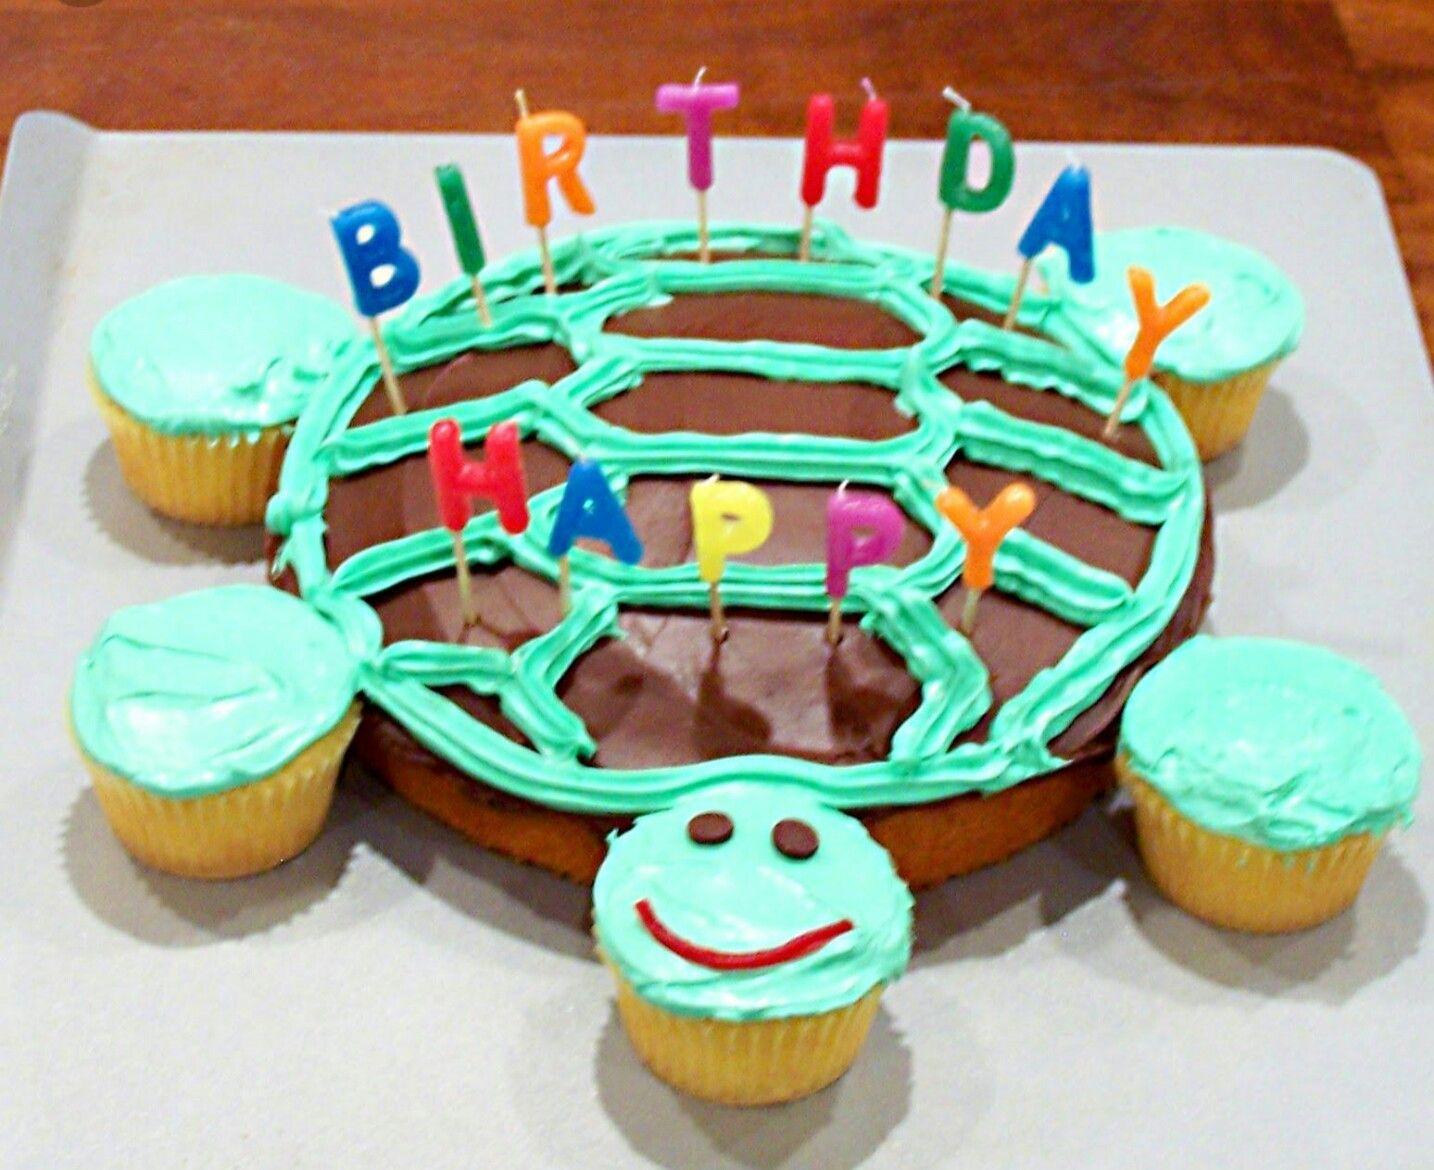 Pin by Leisha Cooper on Birthday Ideas Pinterest Birthday cakes